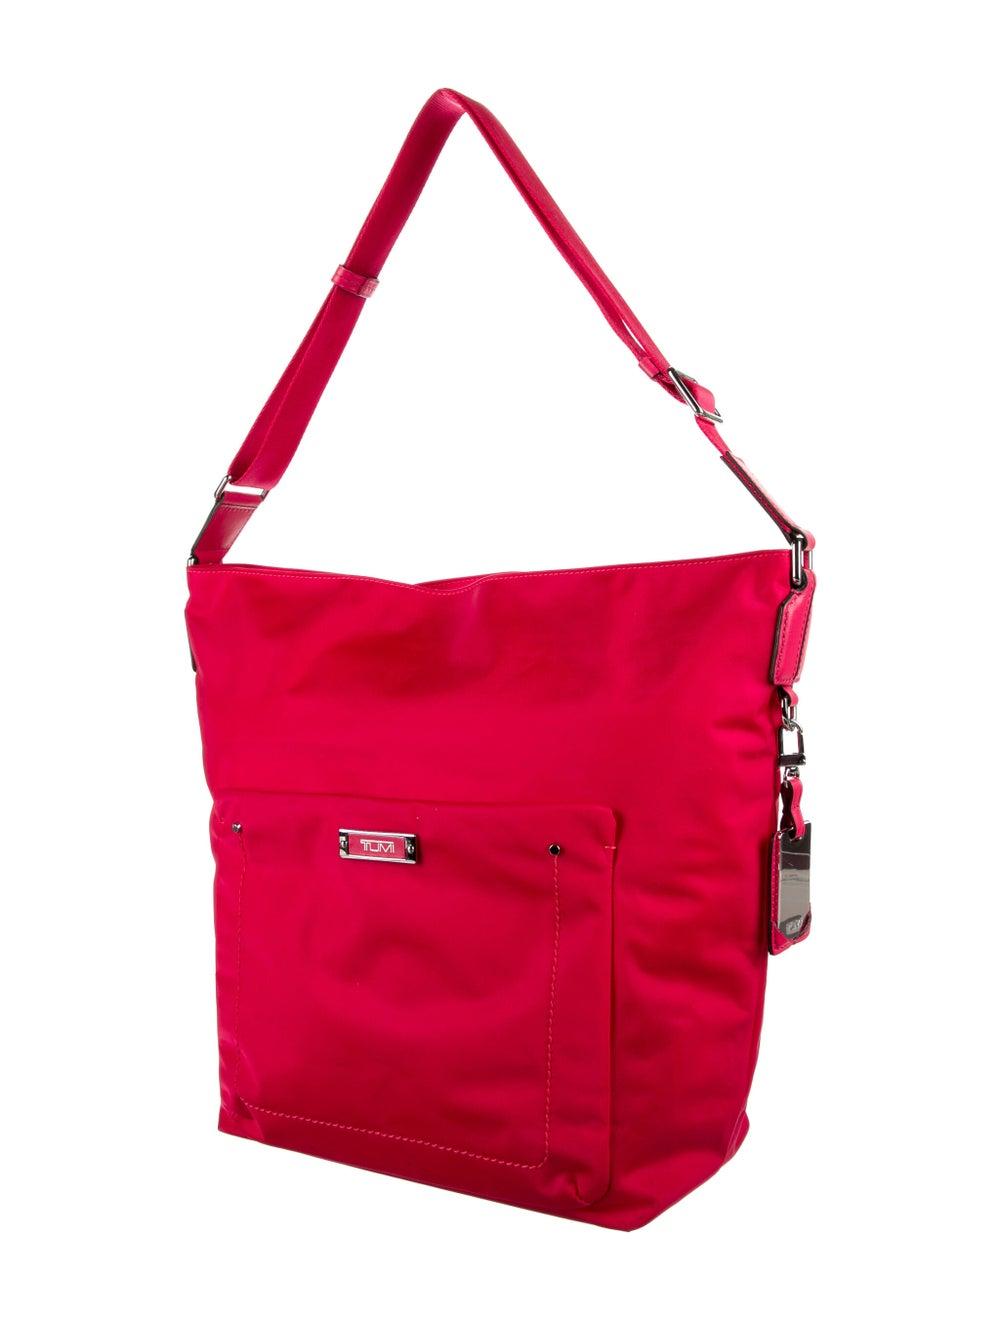 Tumi Nylon Shoulder Bag Pink - image 3